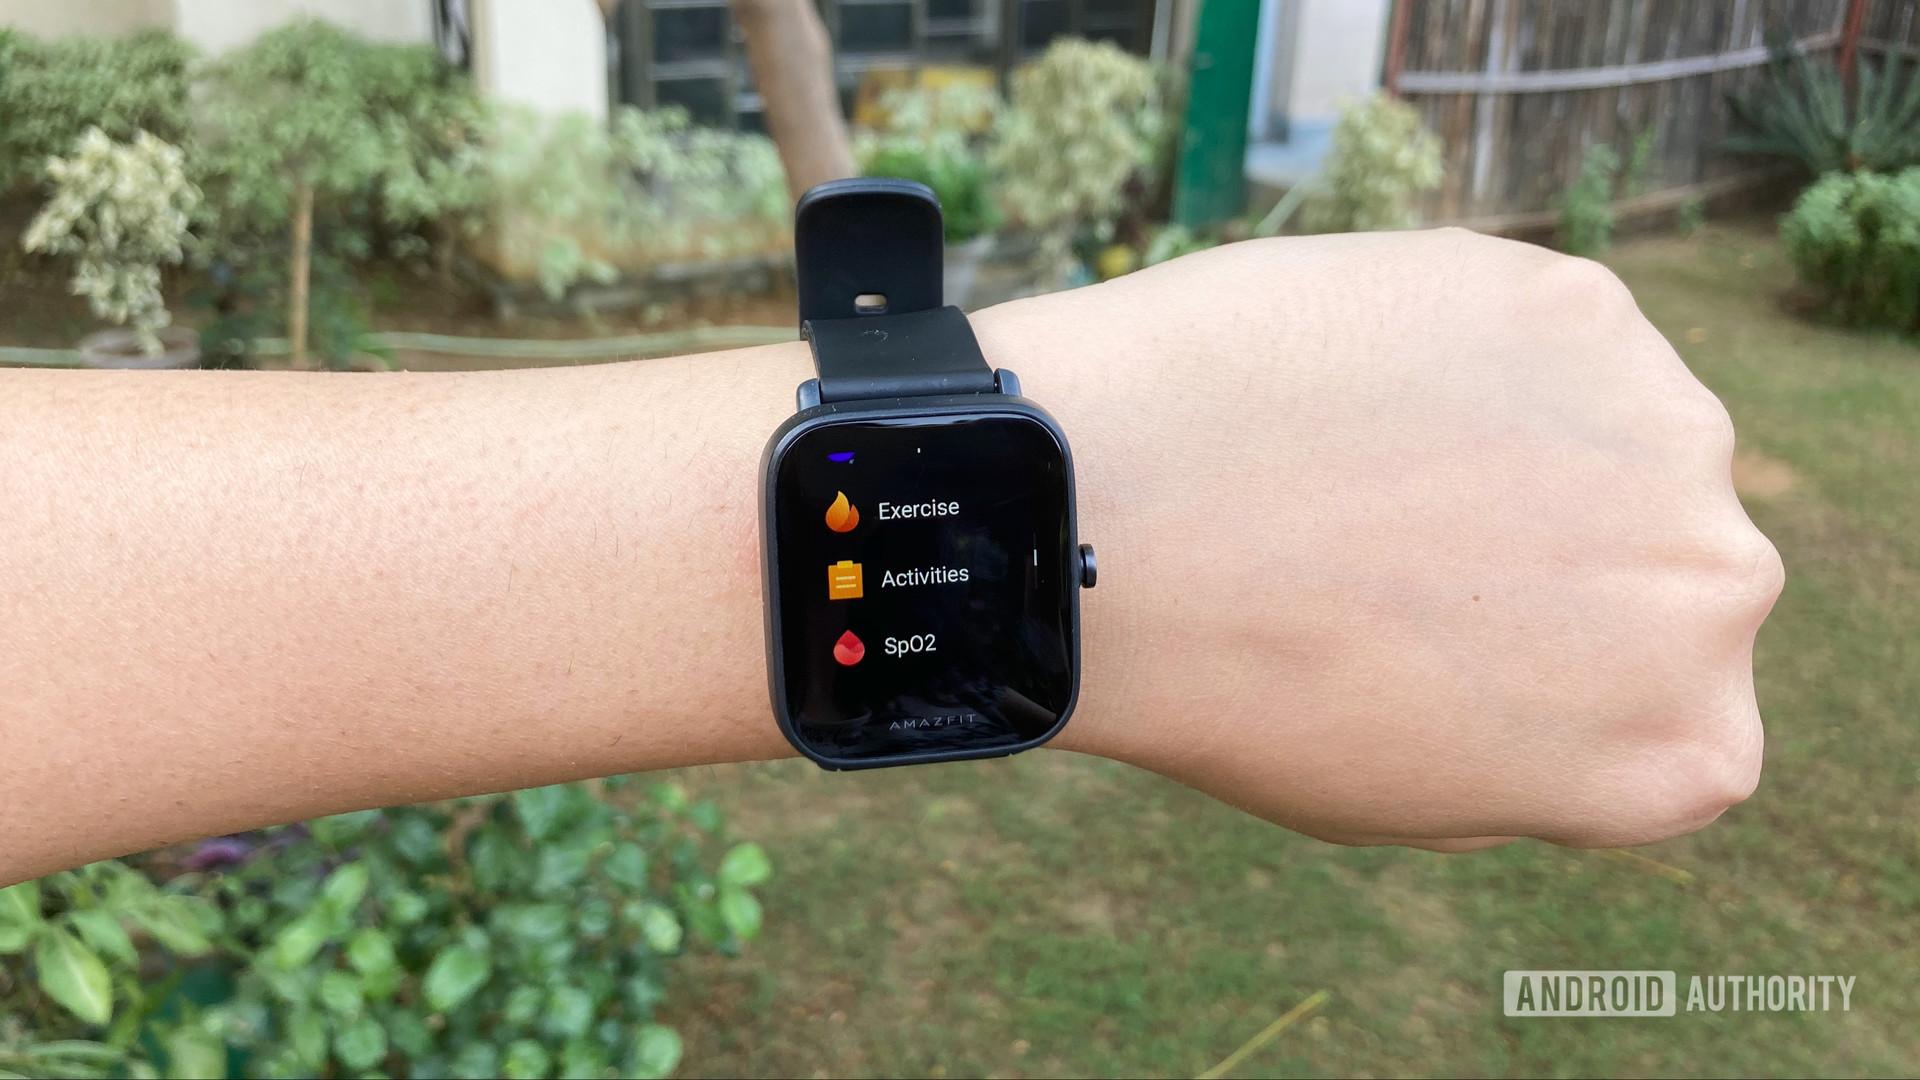 Amazfit Bip U On Wrist Showing SpO2 Feature